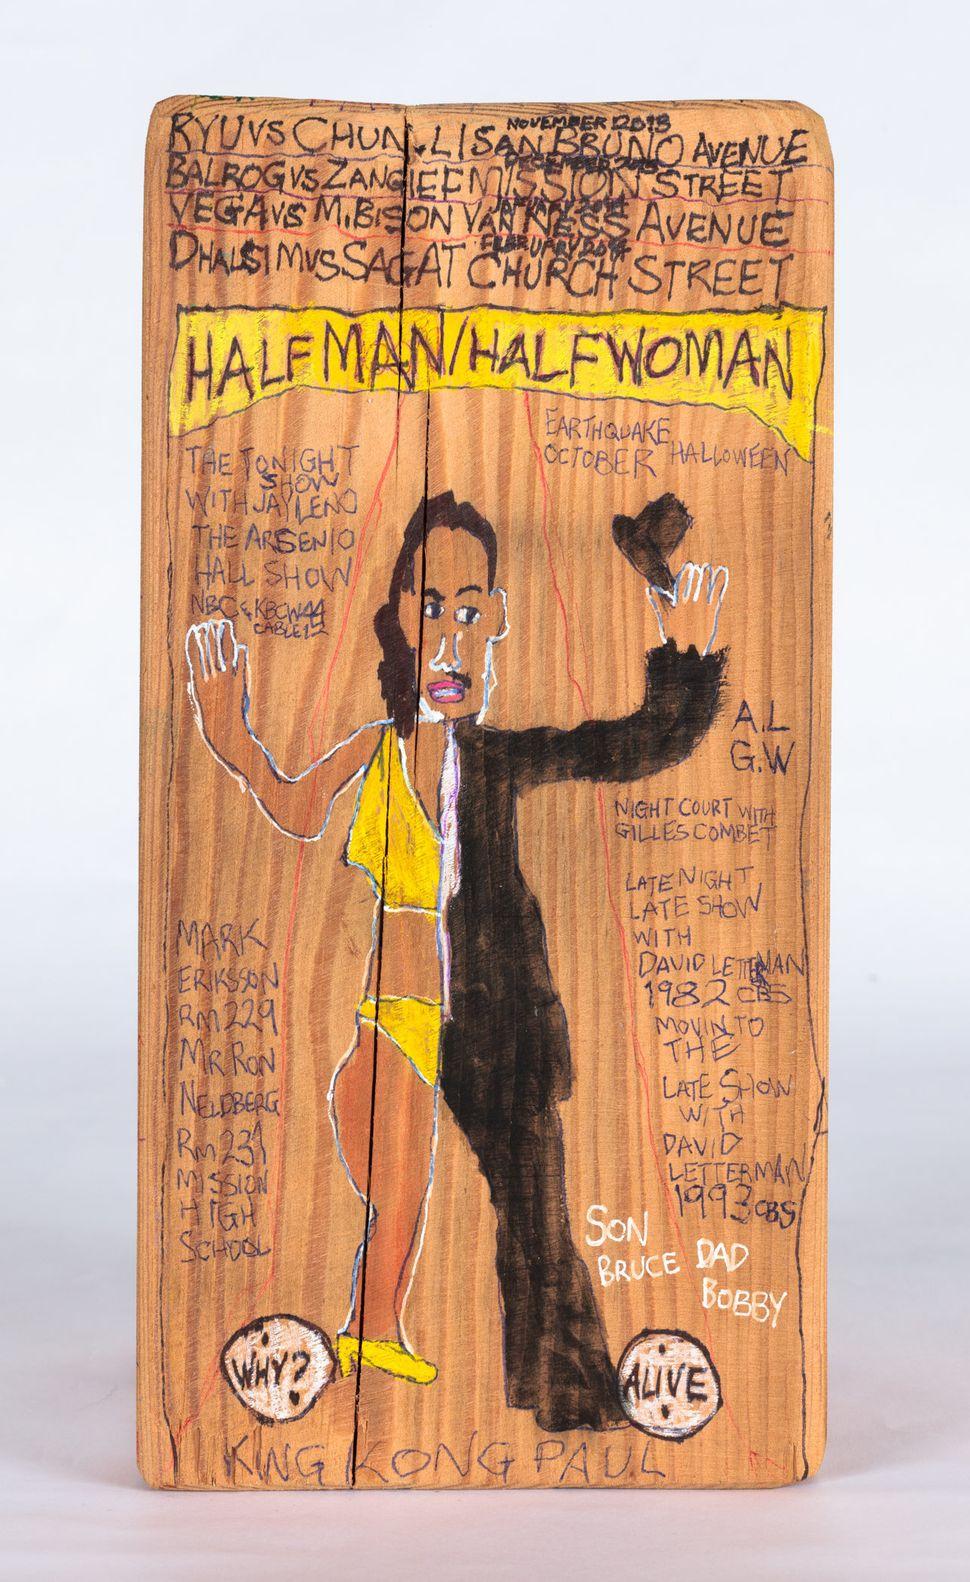 HalfMan/HalfWoman byDanielGreen©2013 CreativityExplored Licensing,LLC, mixedmediaonwood,12x6x6inches.